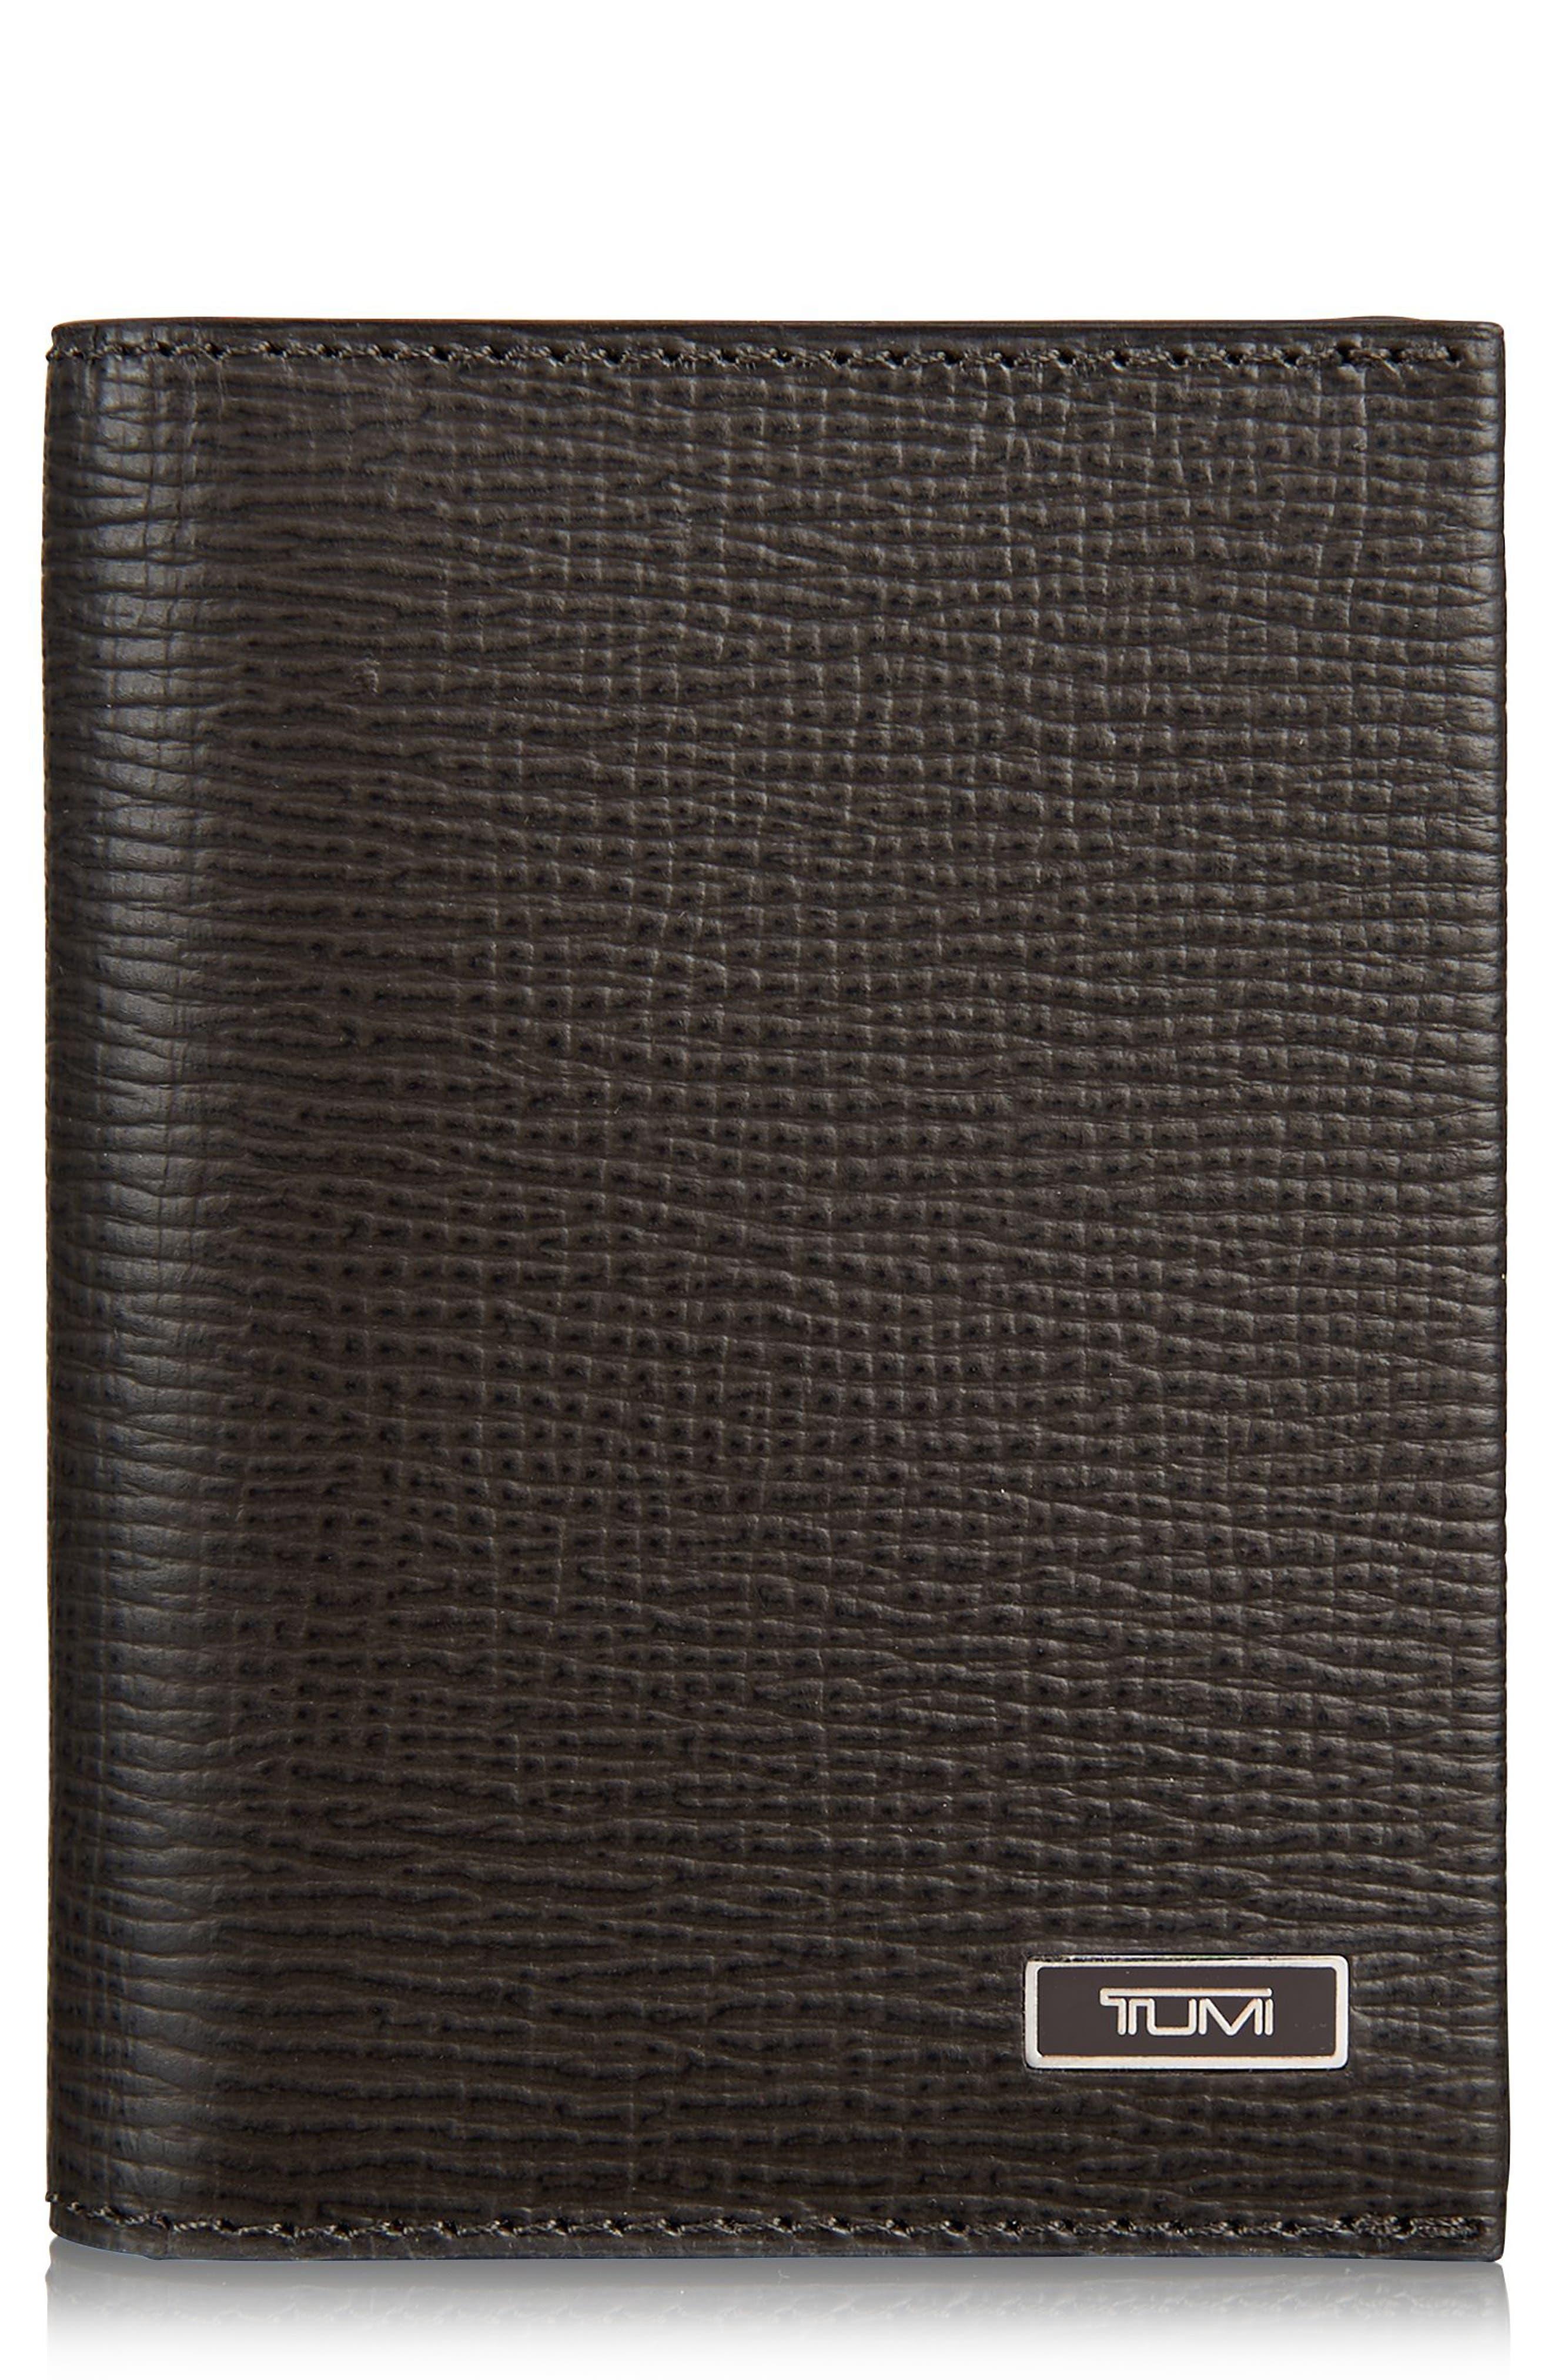 Monaco Leather Card Case,                             Main thumbnail 1, color,                             Taupe